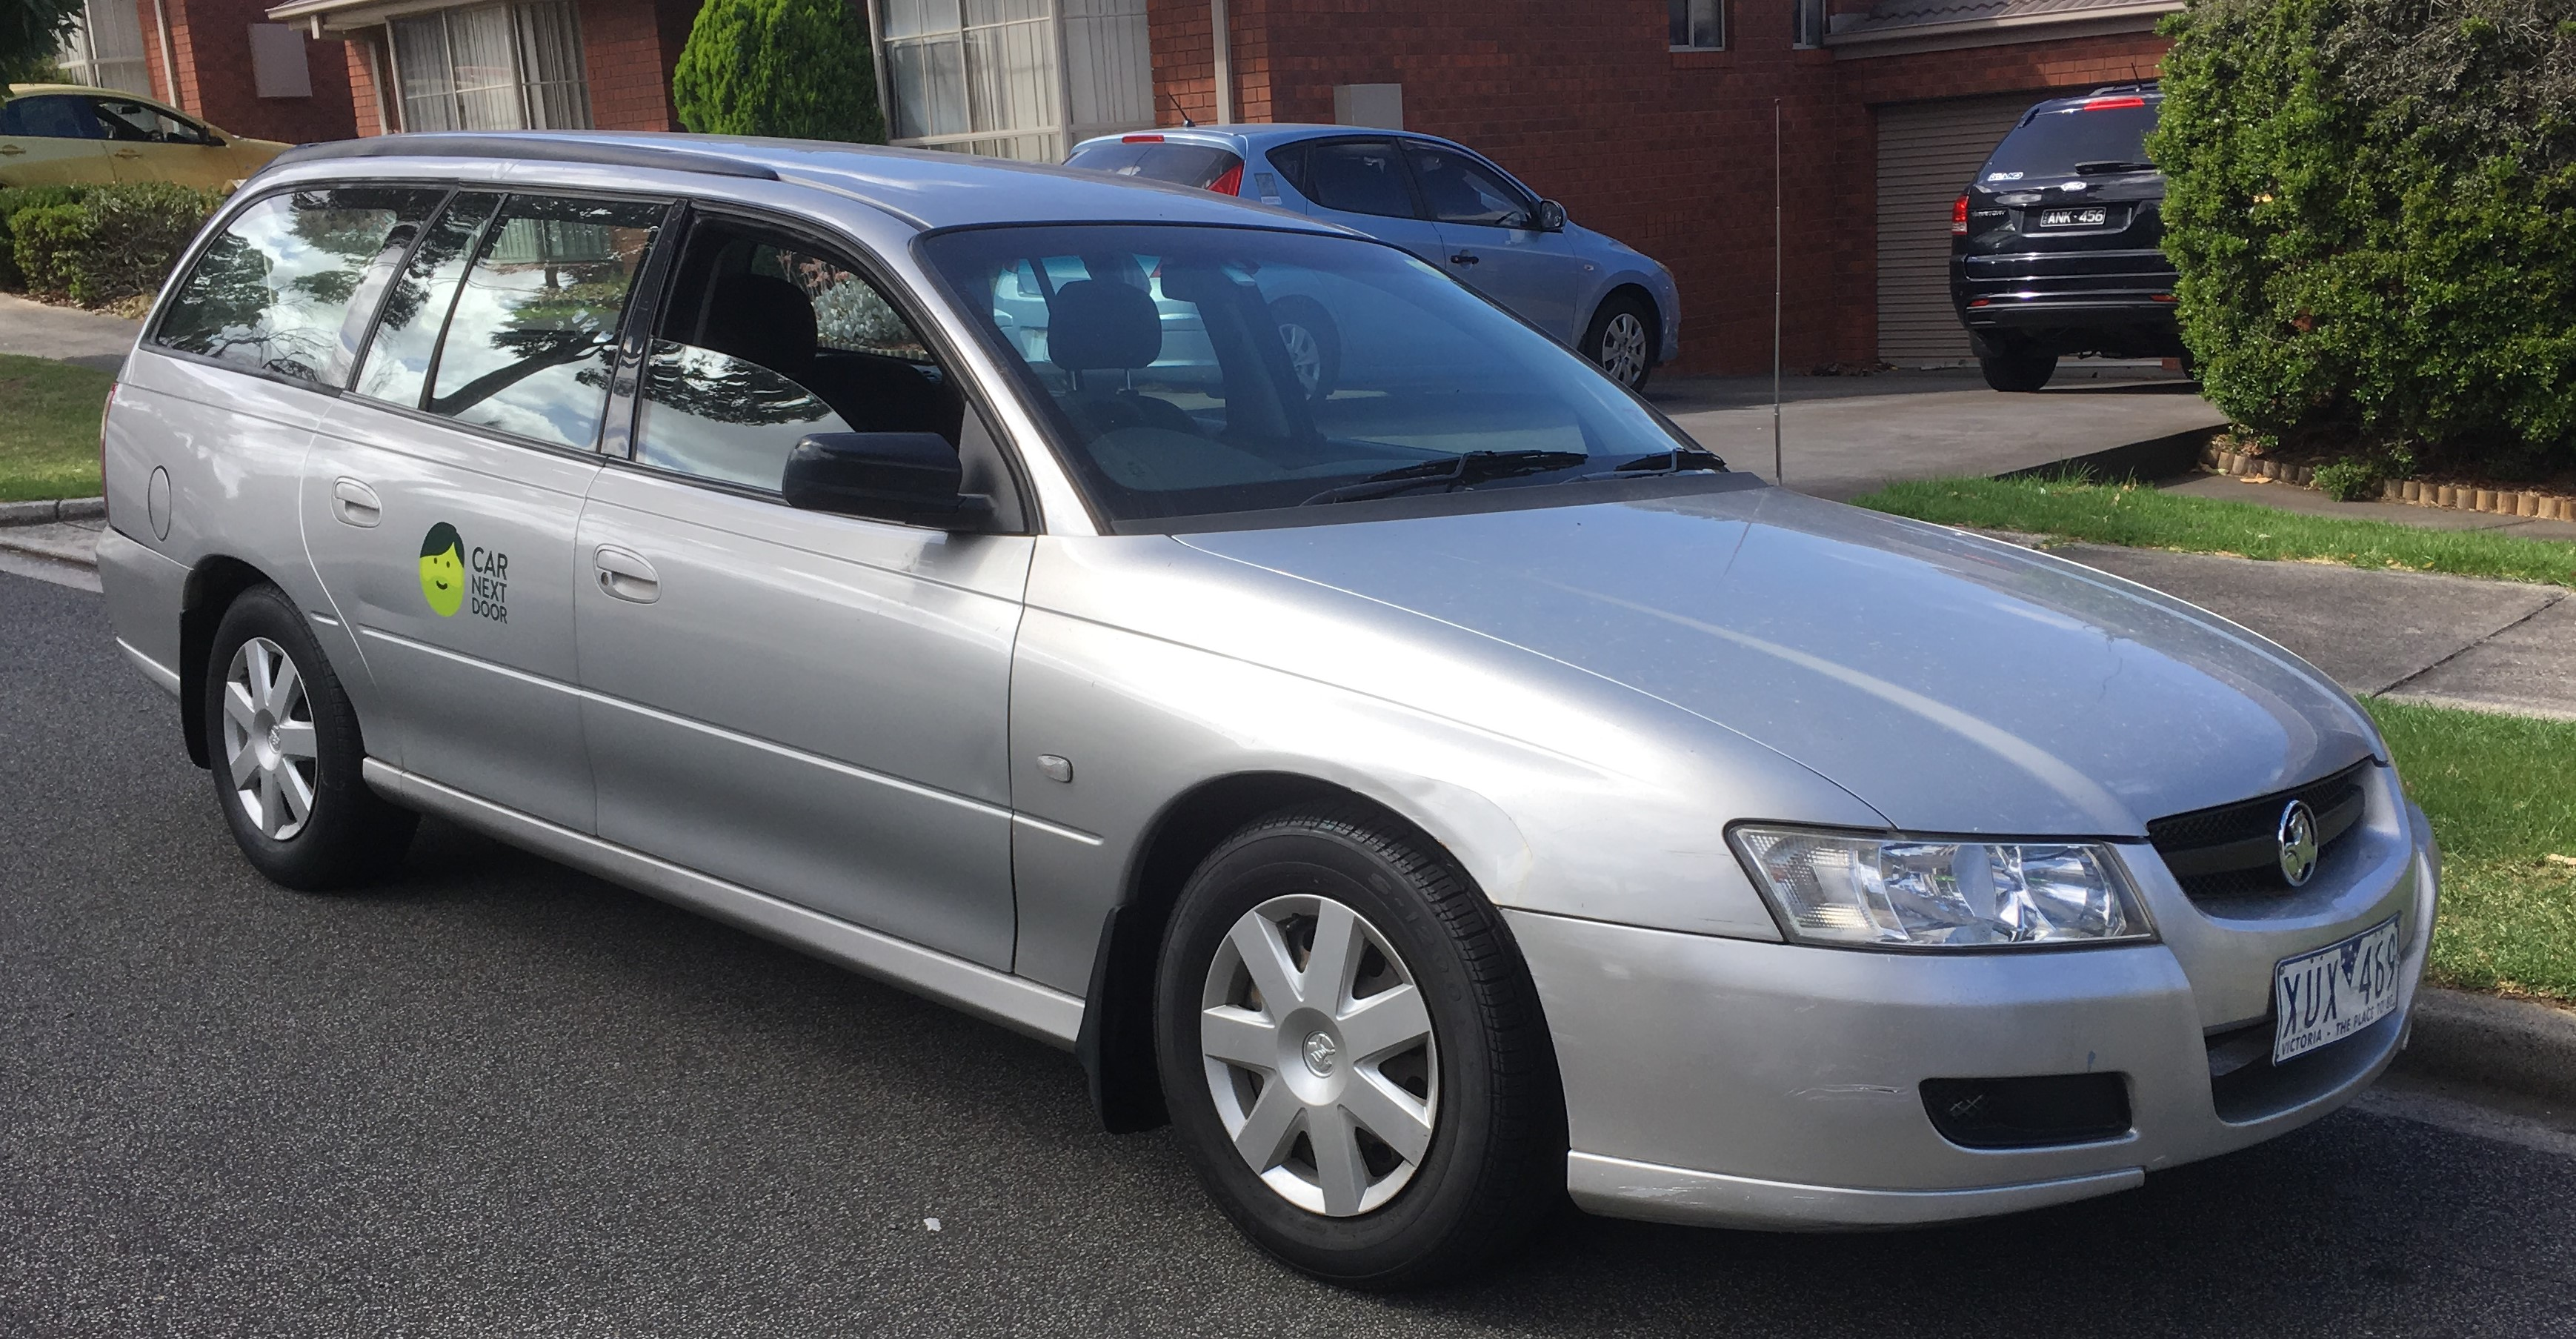 Easy Drive Car And Van Rental